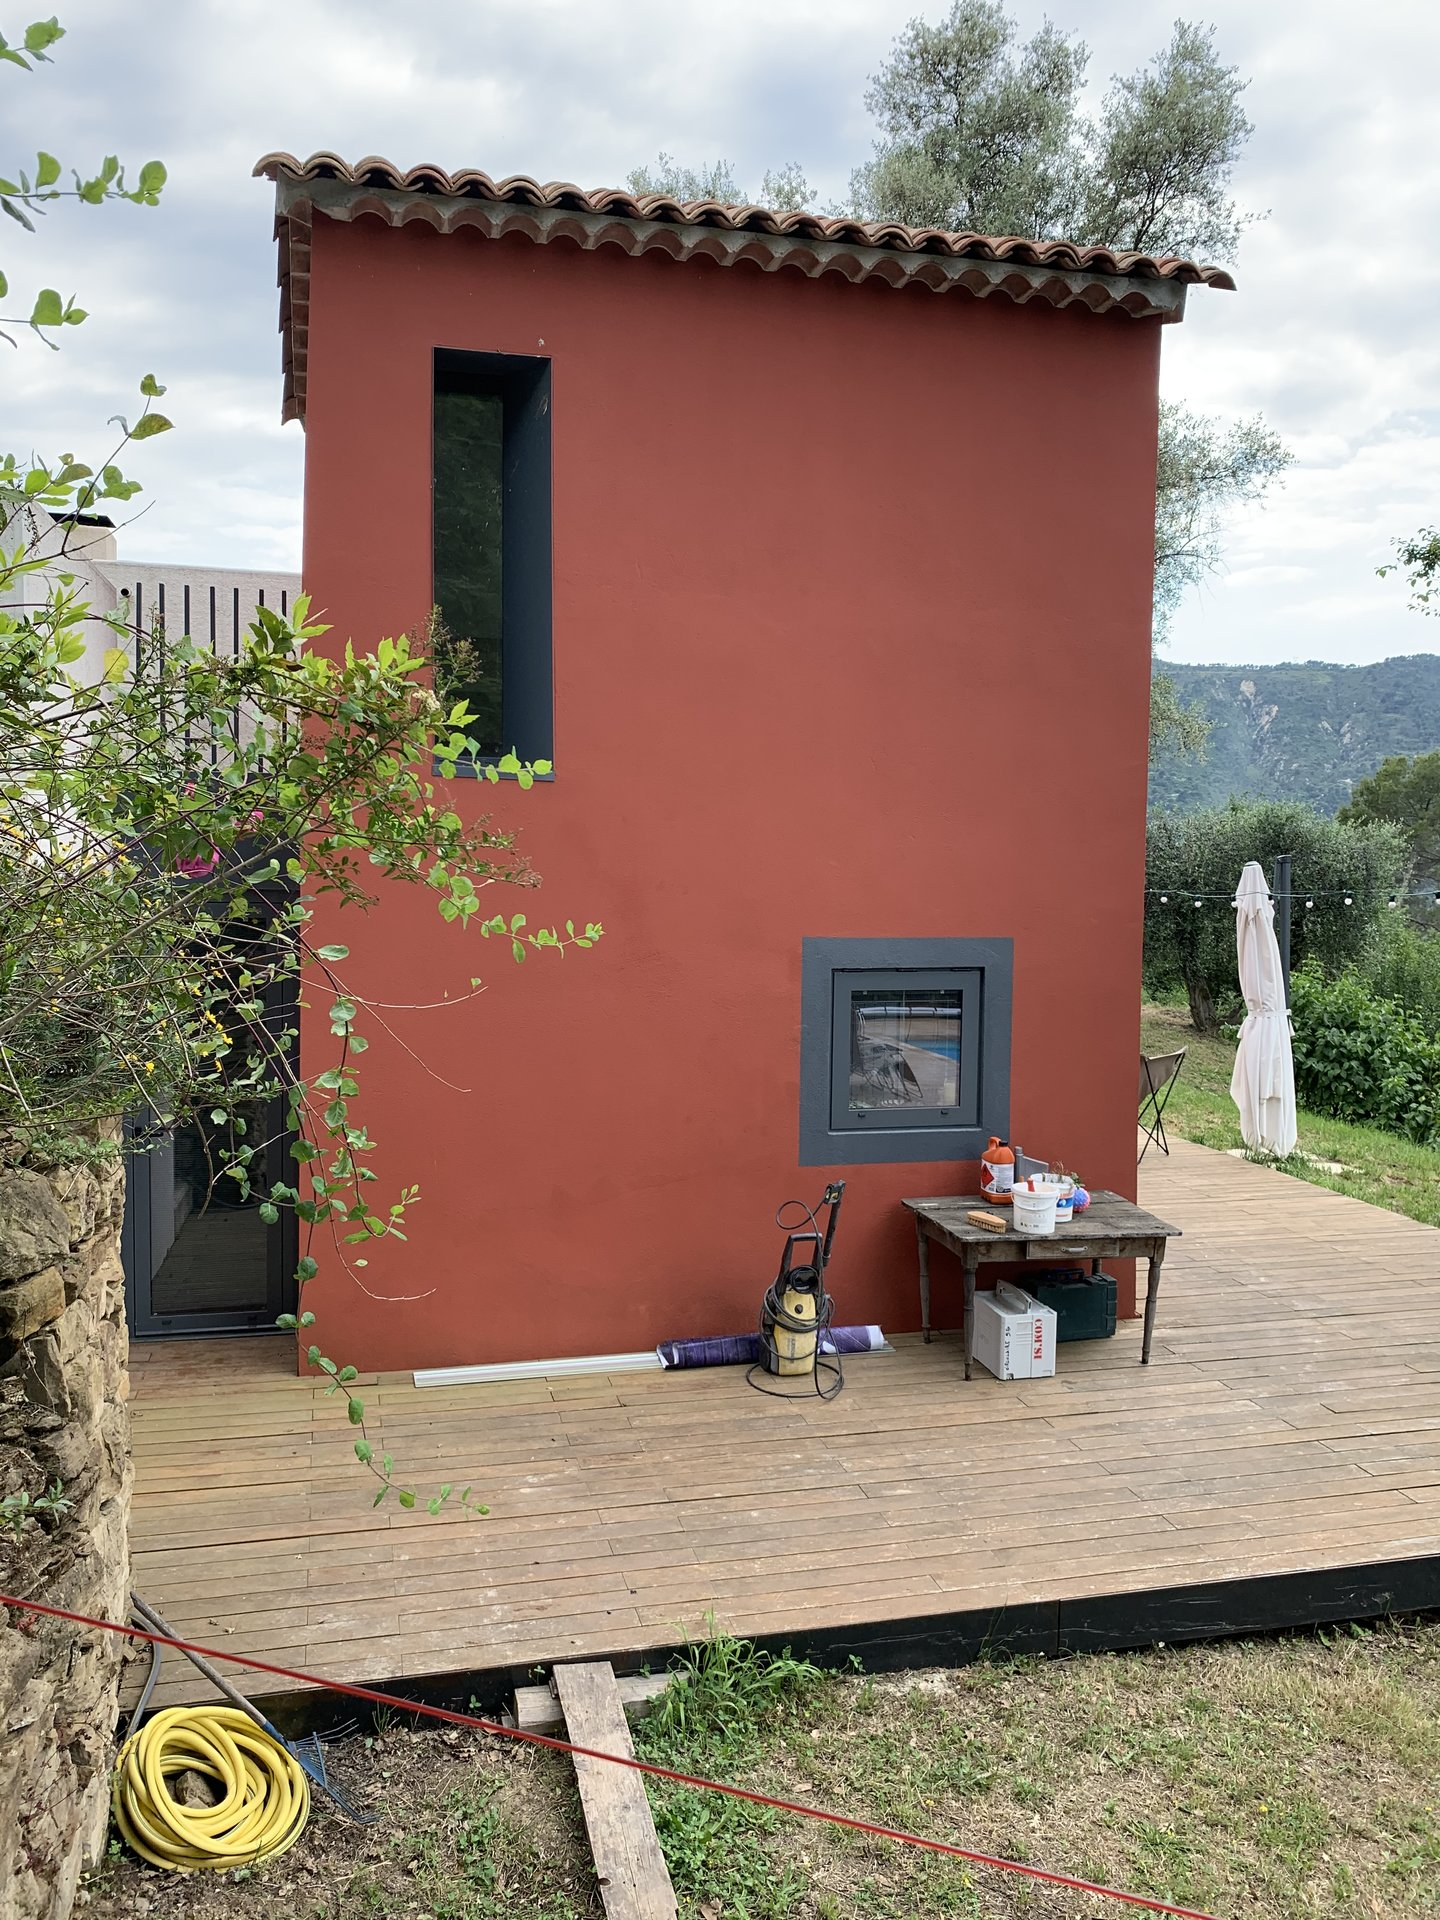 contemporain - rurale, campagne, piscine, terrain, oliviers